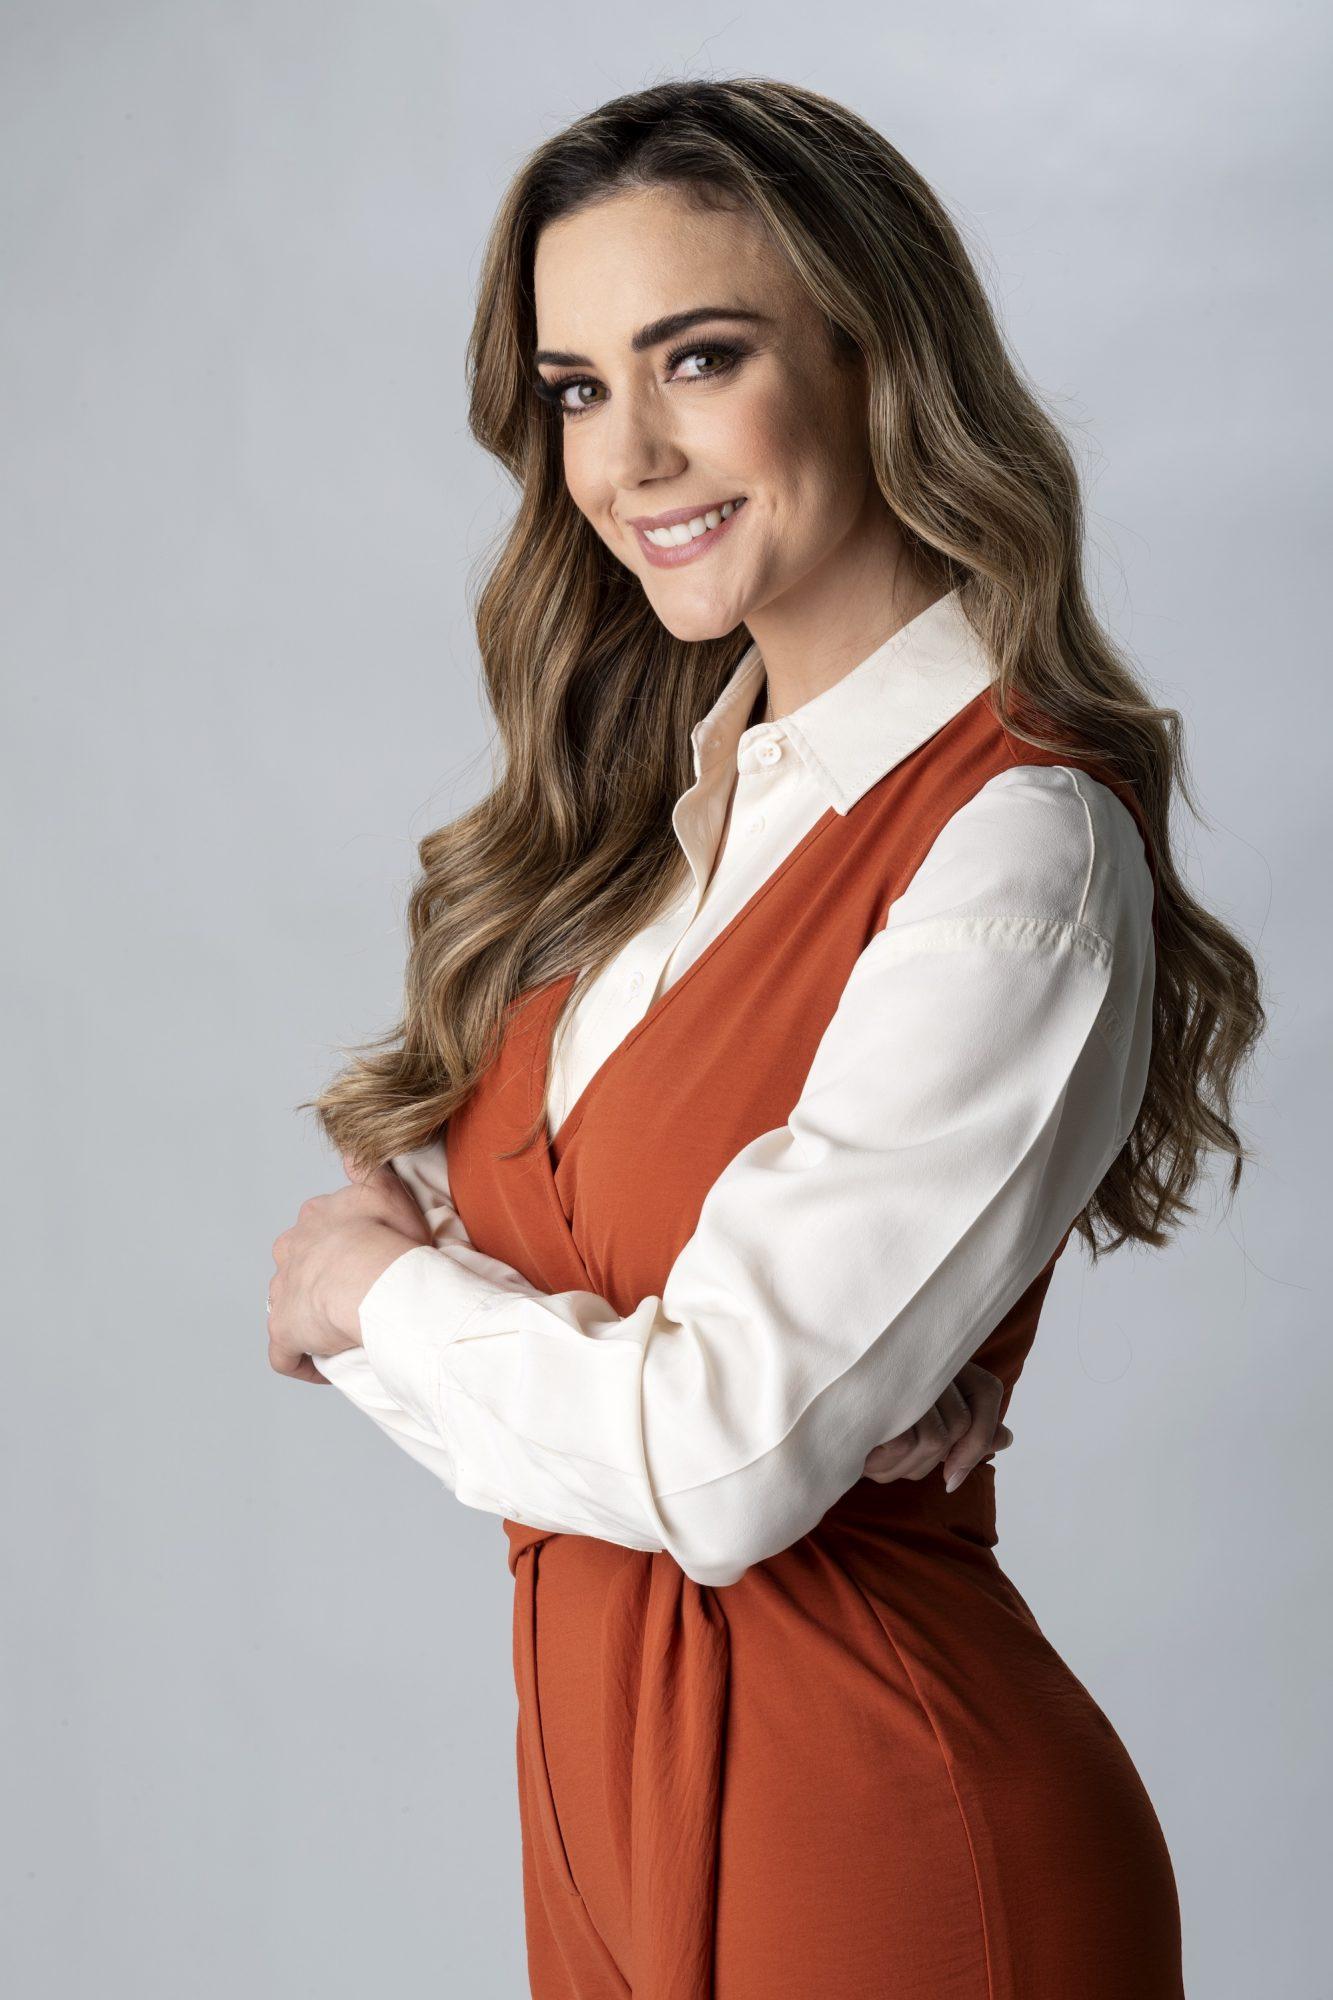 Ana Belena